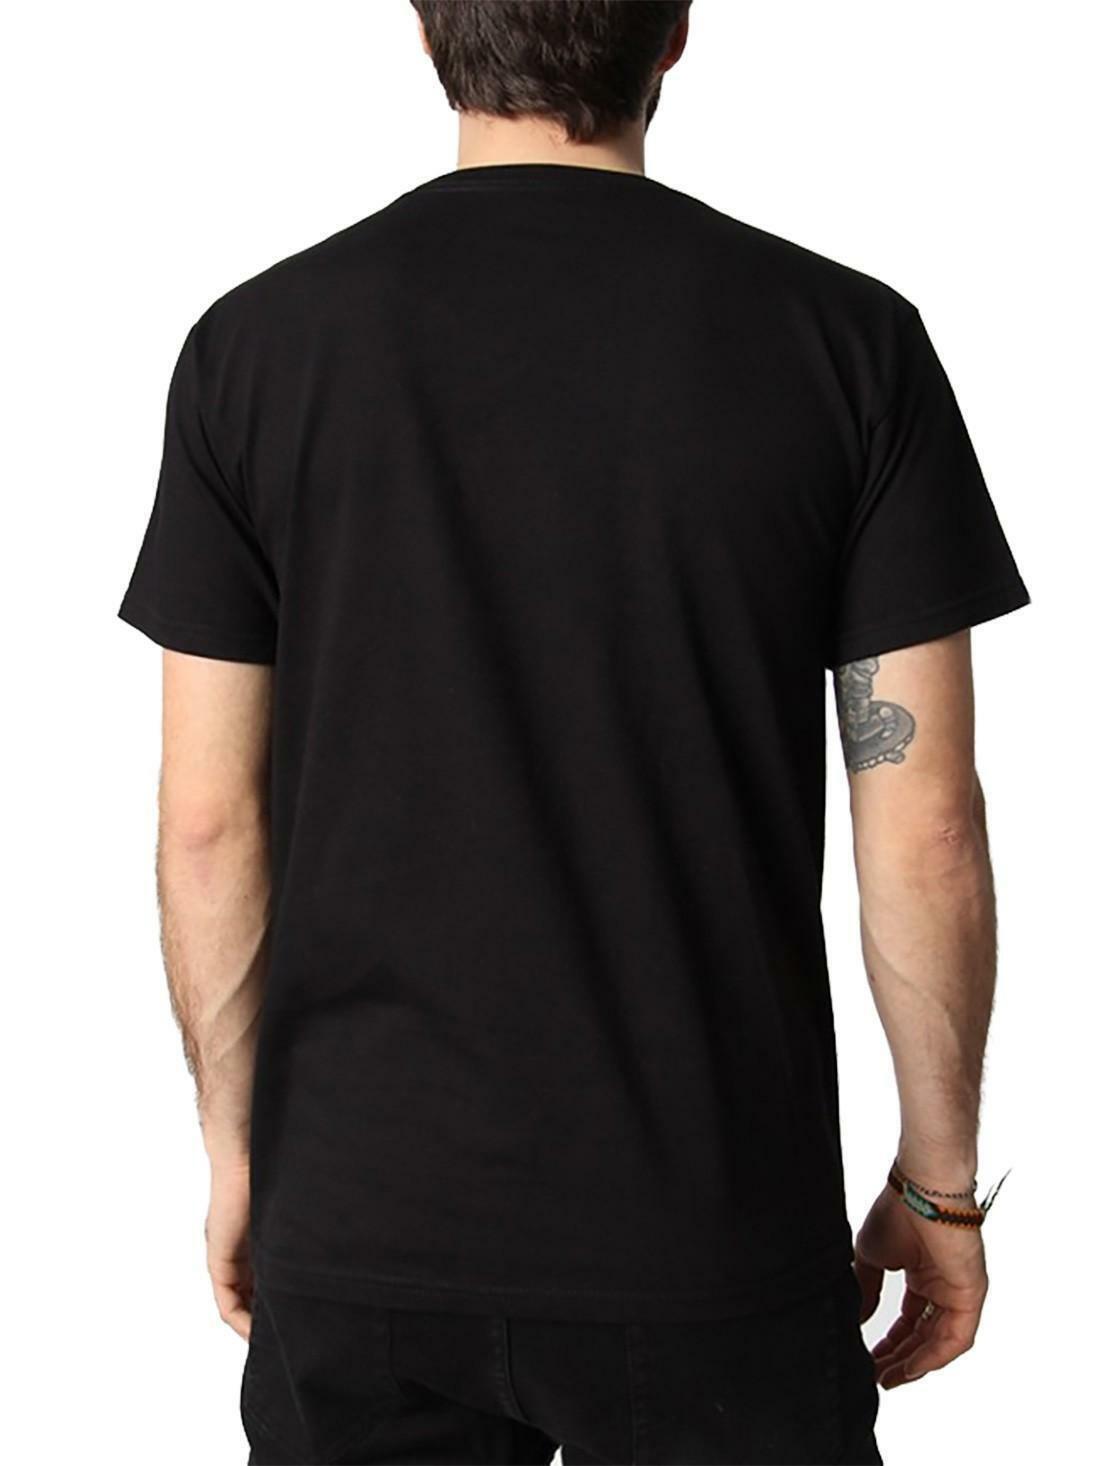 obey obey typewritter t-shirt uomo nera 165371657blk